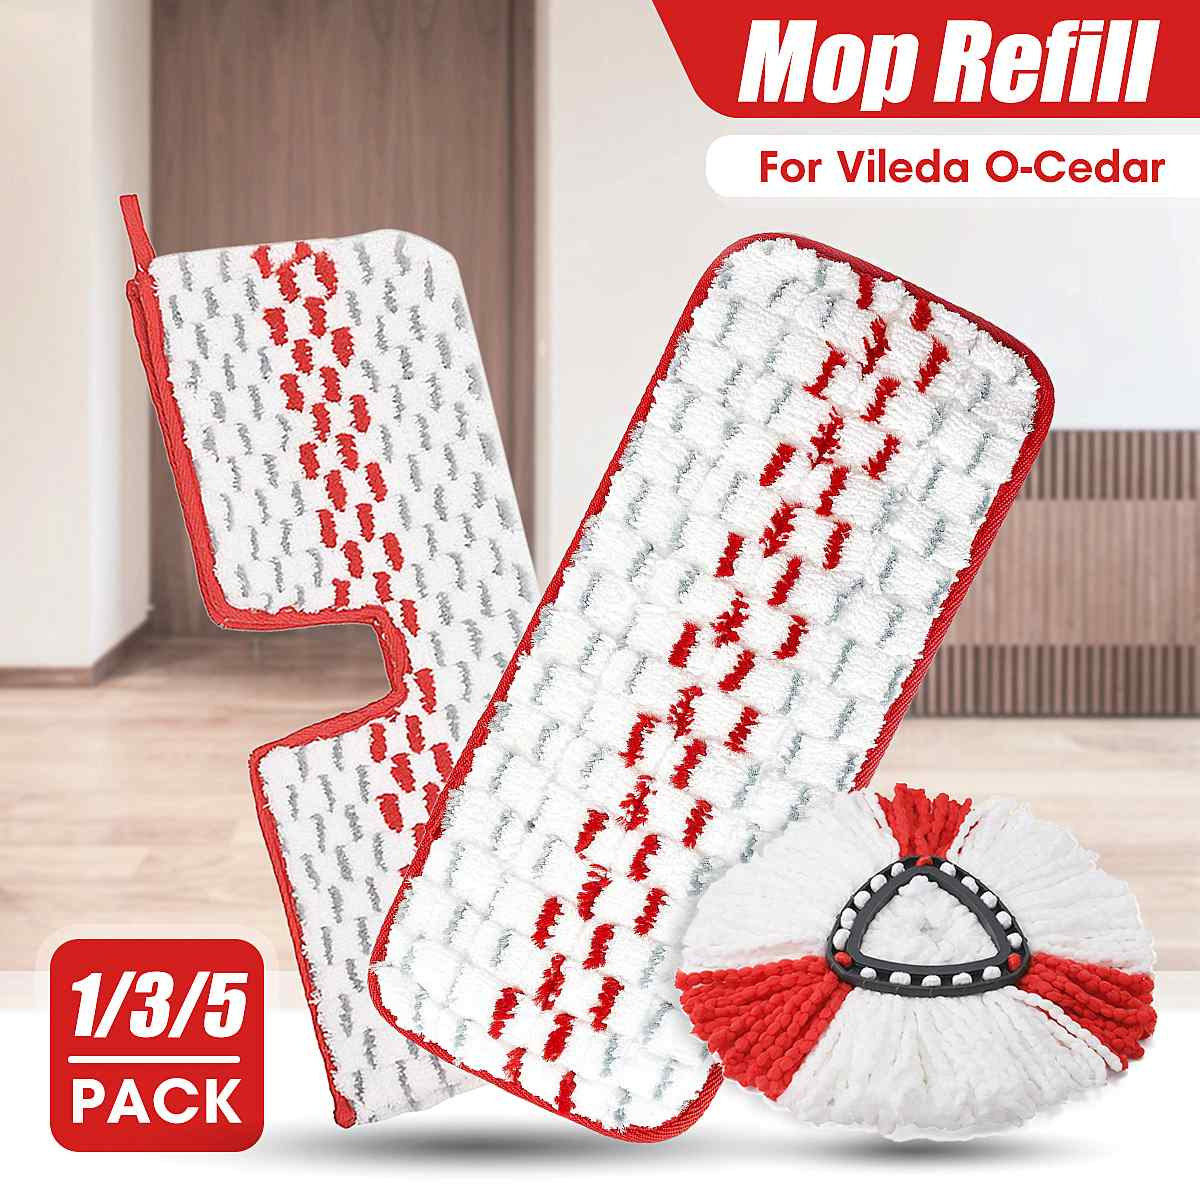 1/3/5pcs Replacement Head Easy Microfiber Spin Mop Refill Floor Mop Head Housekeeper Home Floor Cleaning for Vileda O-Cedar